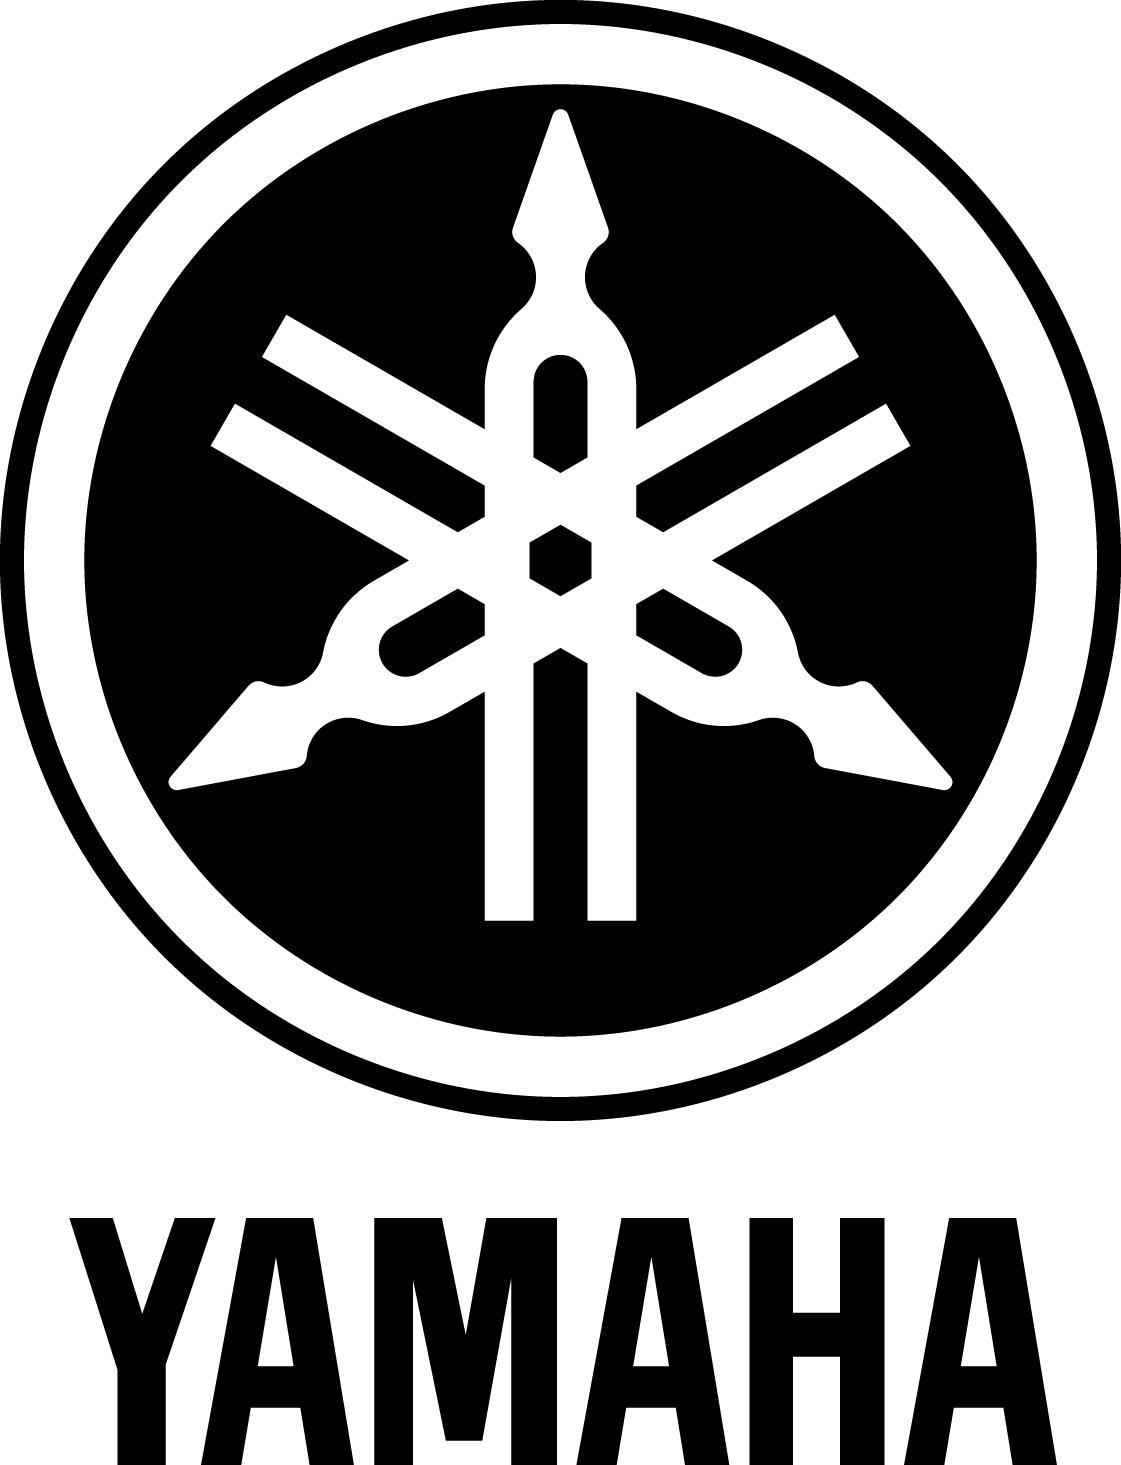 Yamaha logo .jpg - Yamaha PNG